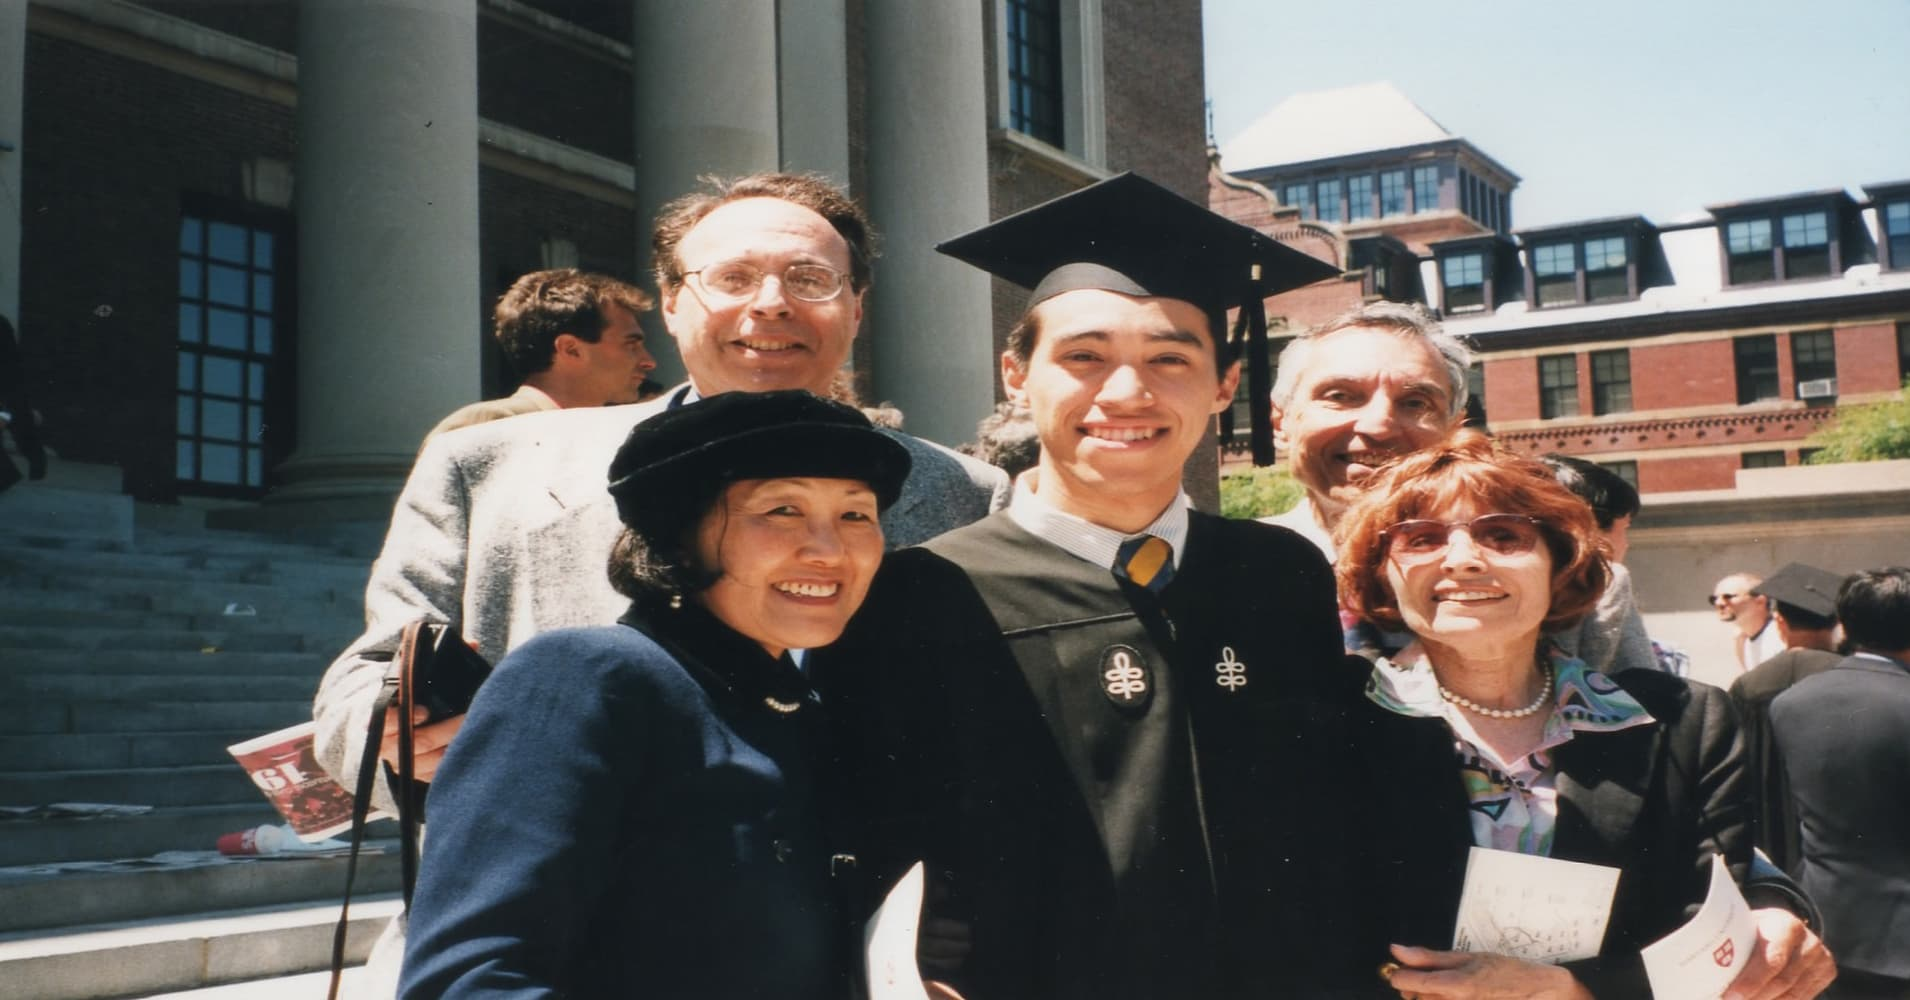 Ben Kaplan graduating from Harvard